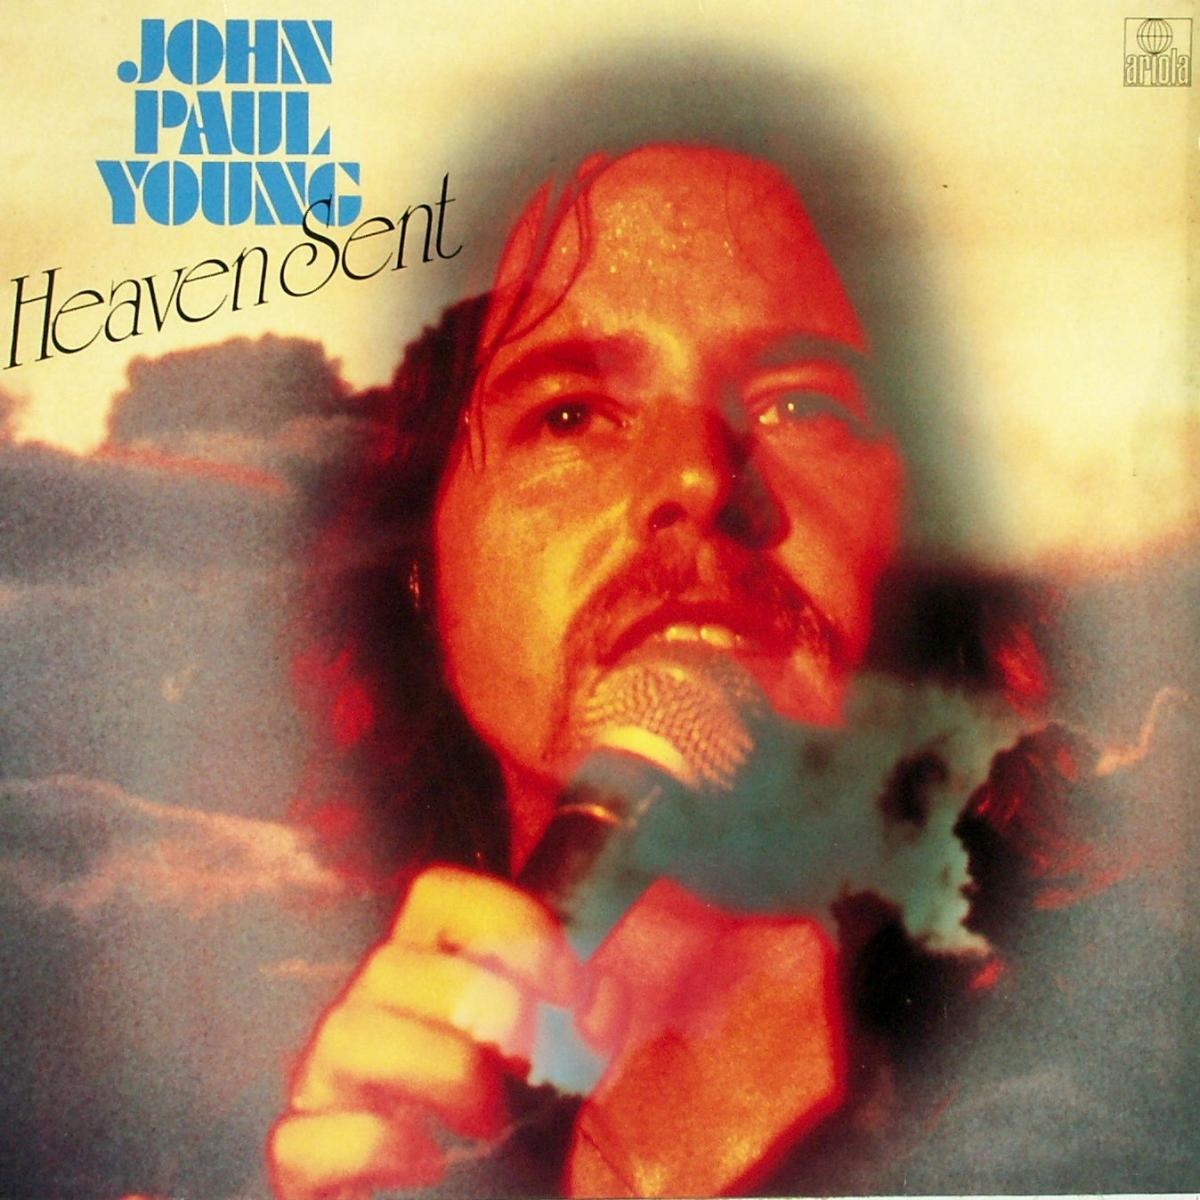 Young, John Paul - Heaven Sent [LP]